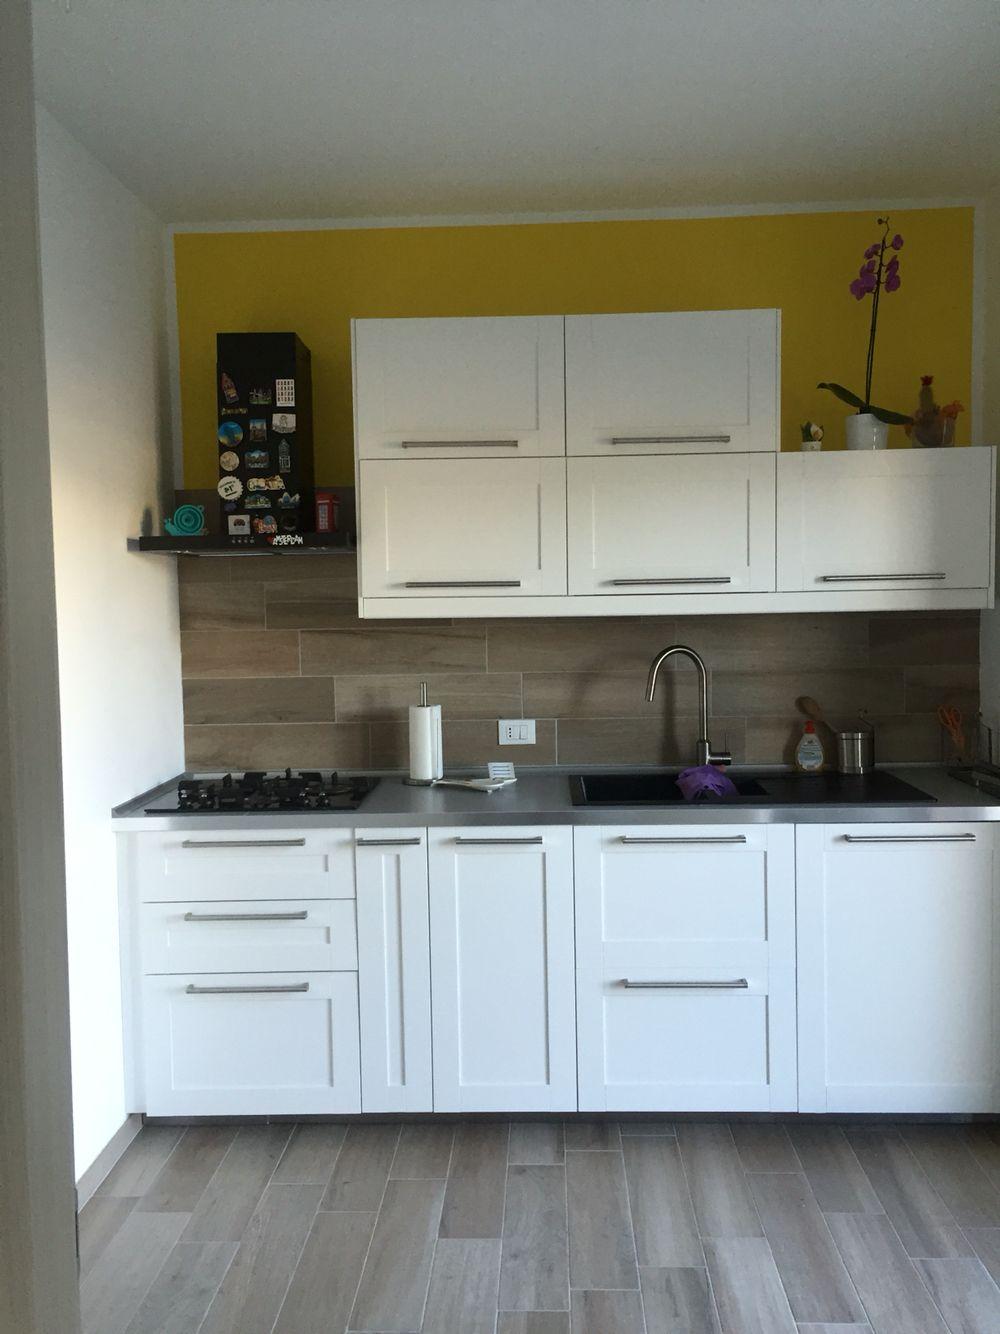 Cucina Ikea savedal  Idee per la casa  Pinterest  Kitchens Dark tile floors and Kitchen small